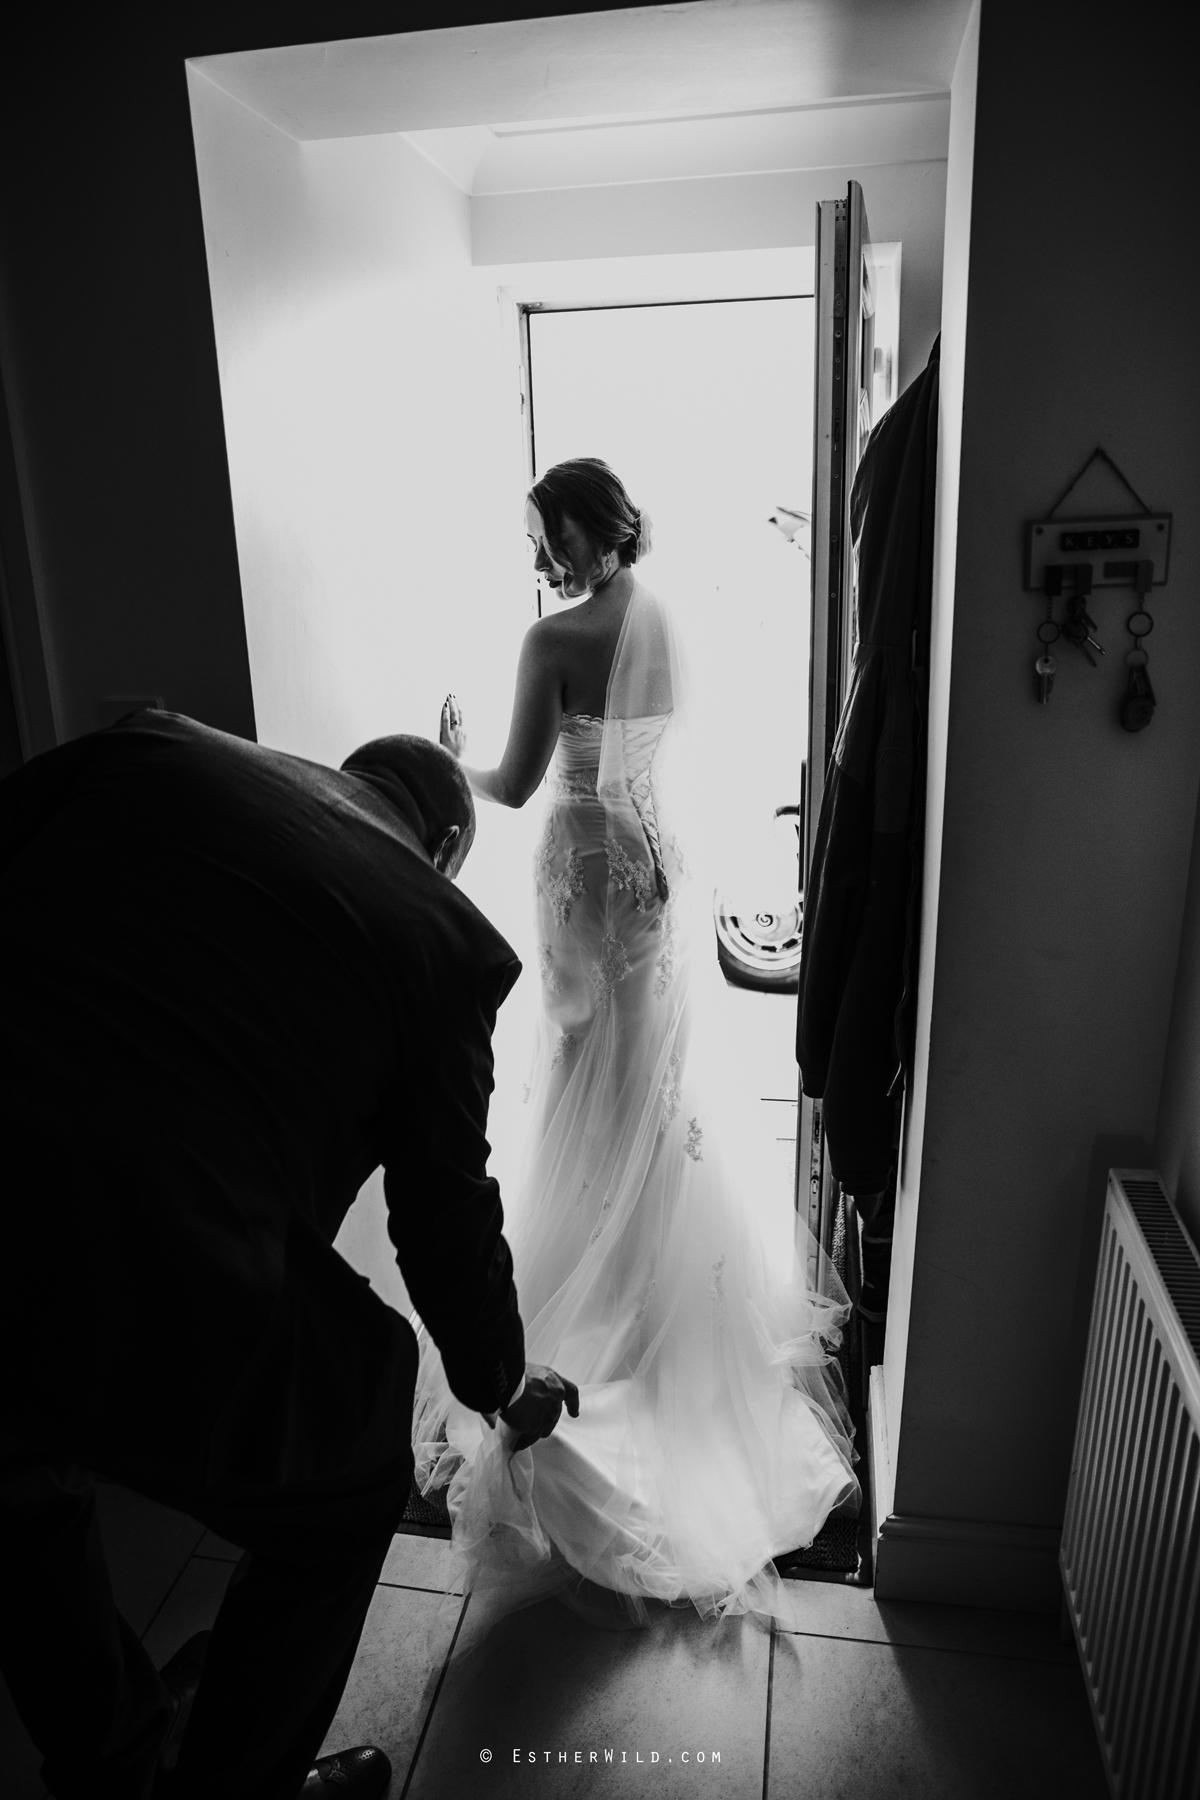 Glebe_Farm_Barn_Rustic_Norfolk_Wedding_Esther_Wild_Photographer_Copyright_IMG_0431-2.jpg